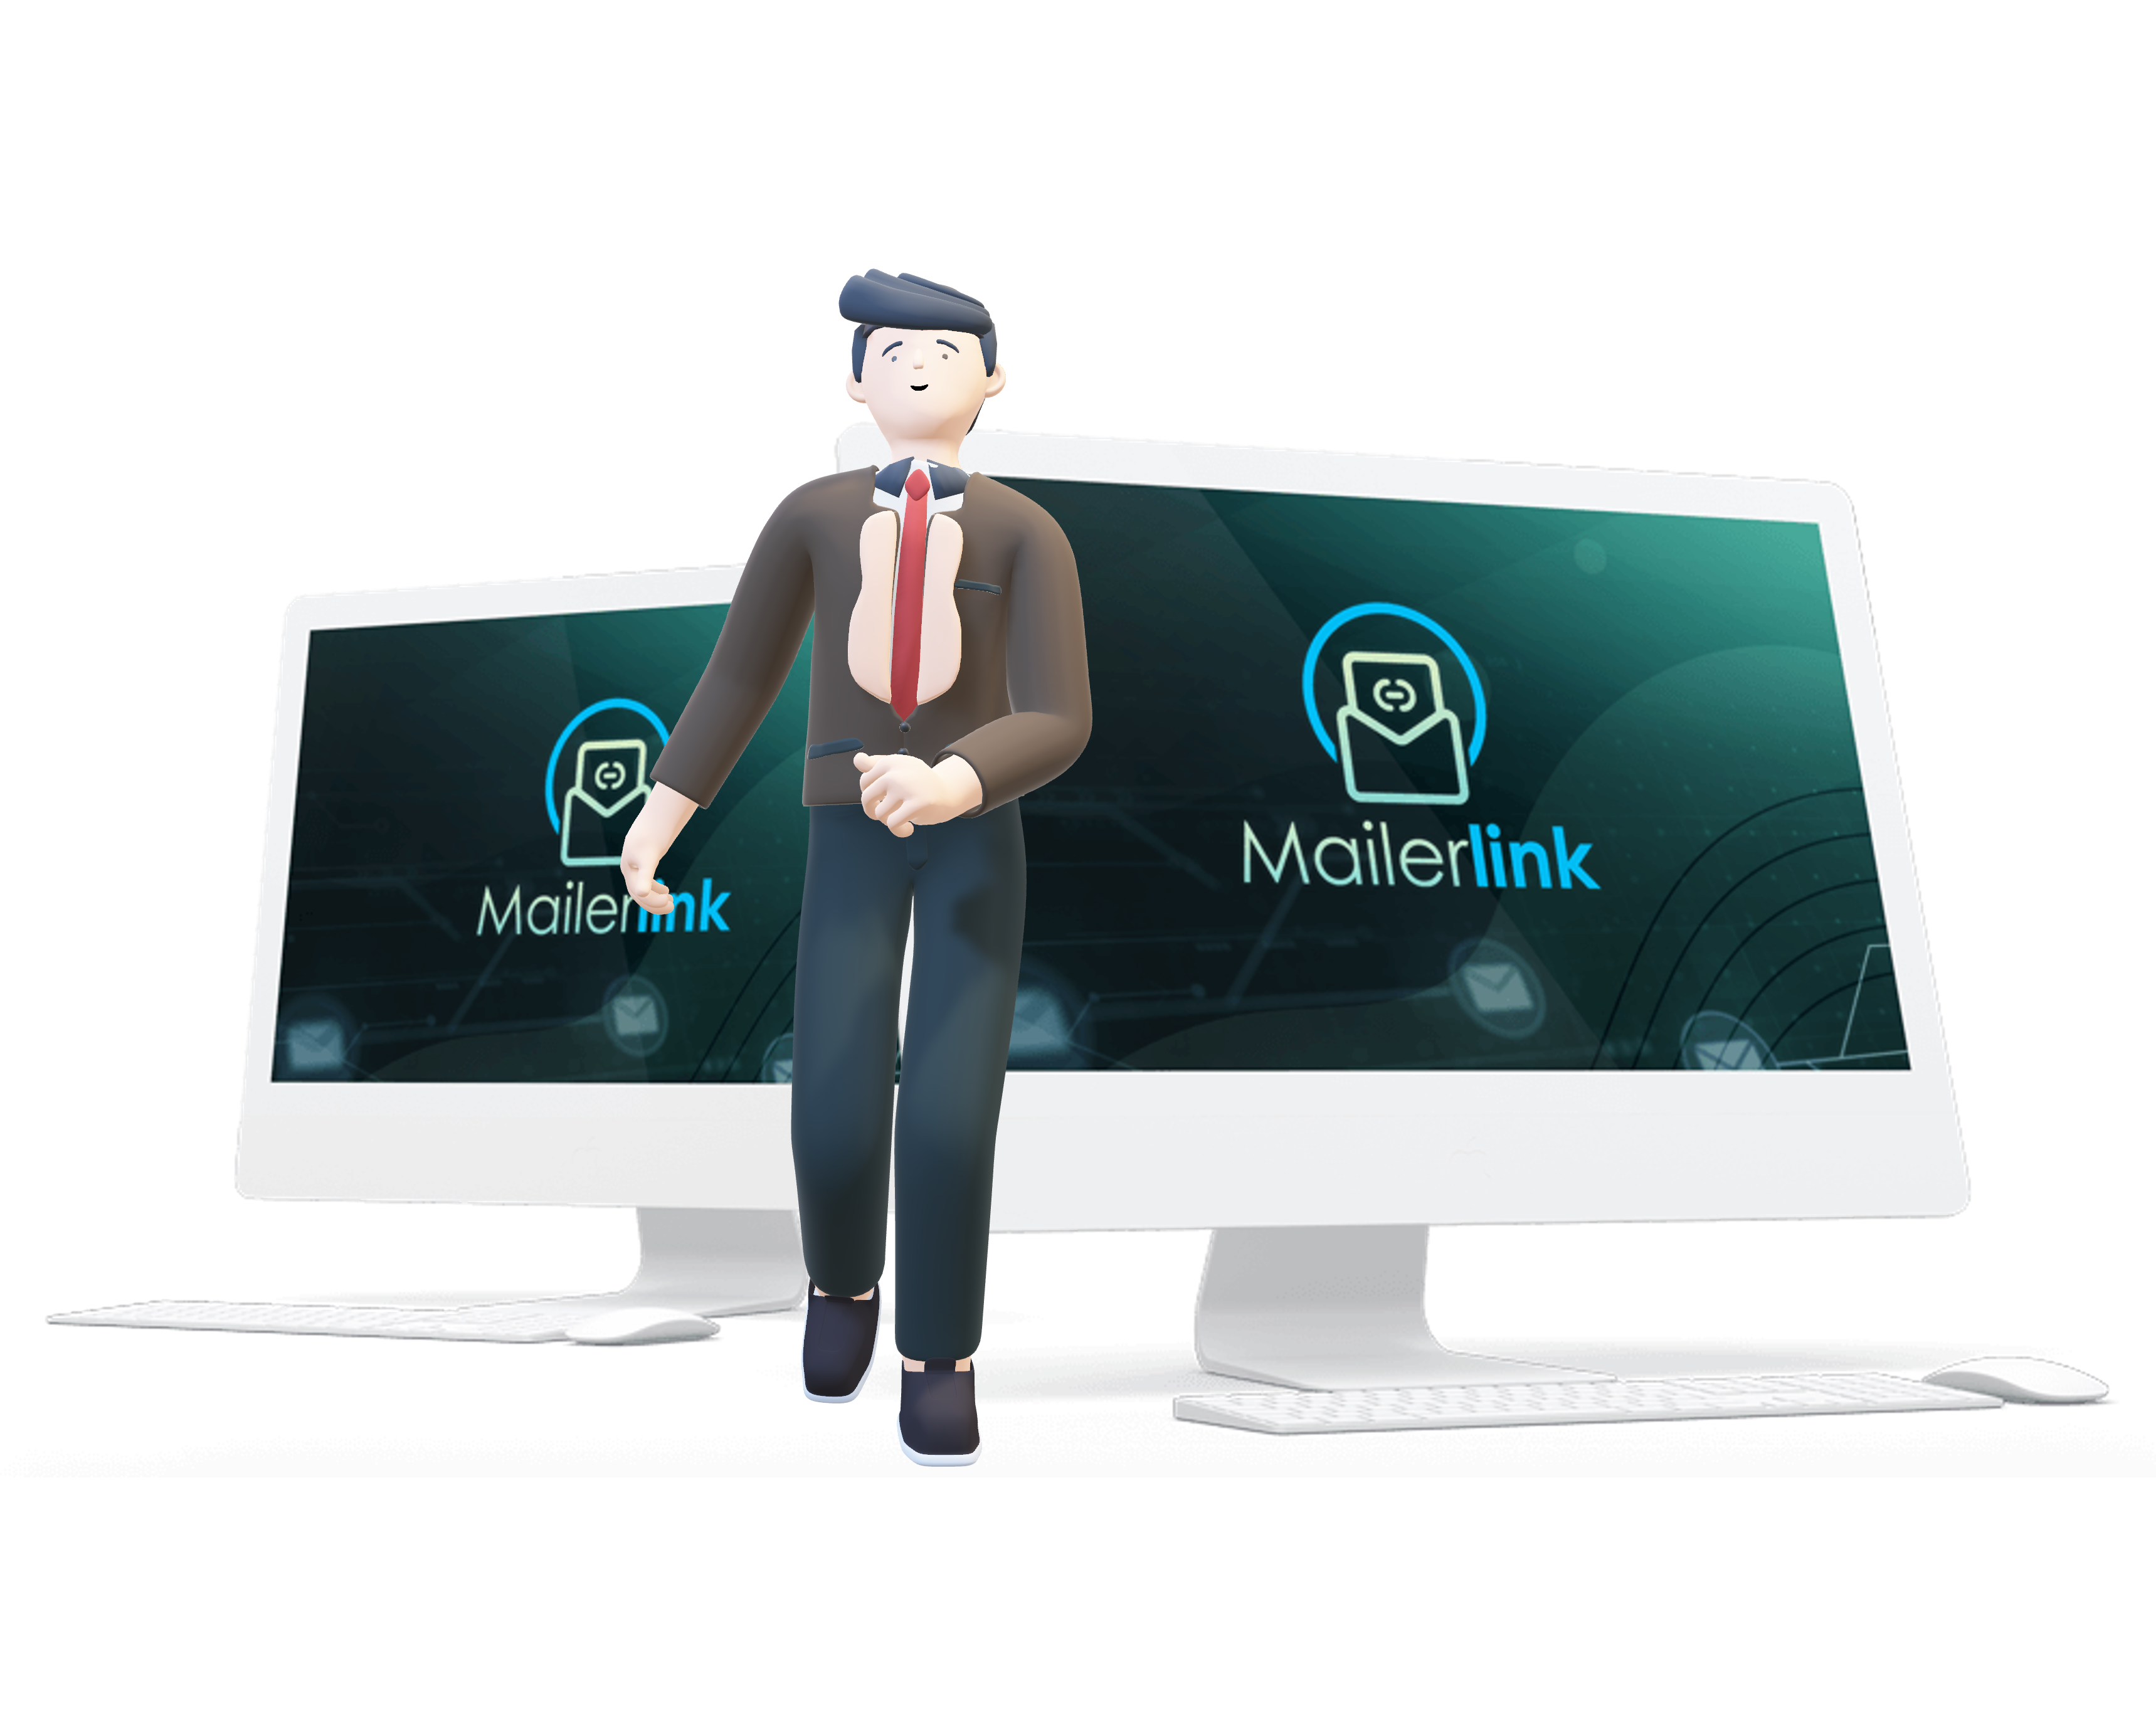 EmailerLink - Find High Targeted Lead Prospect with Keyword